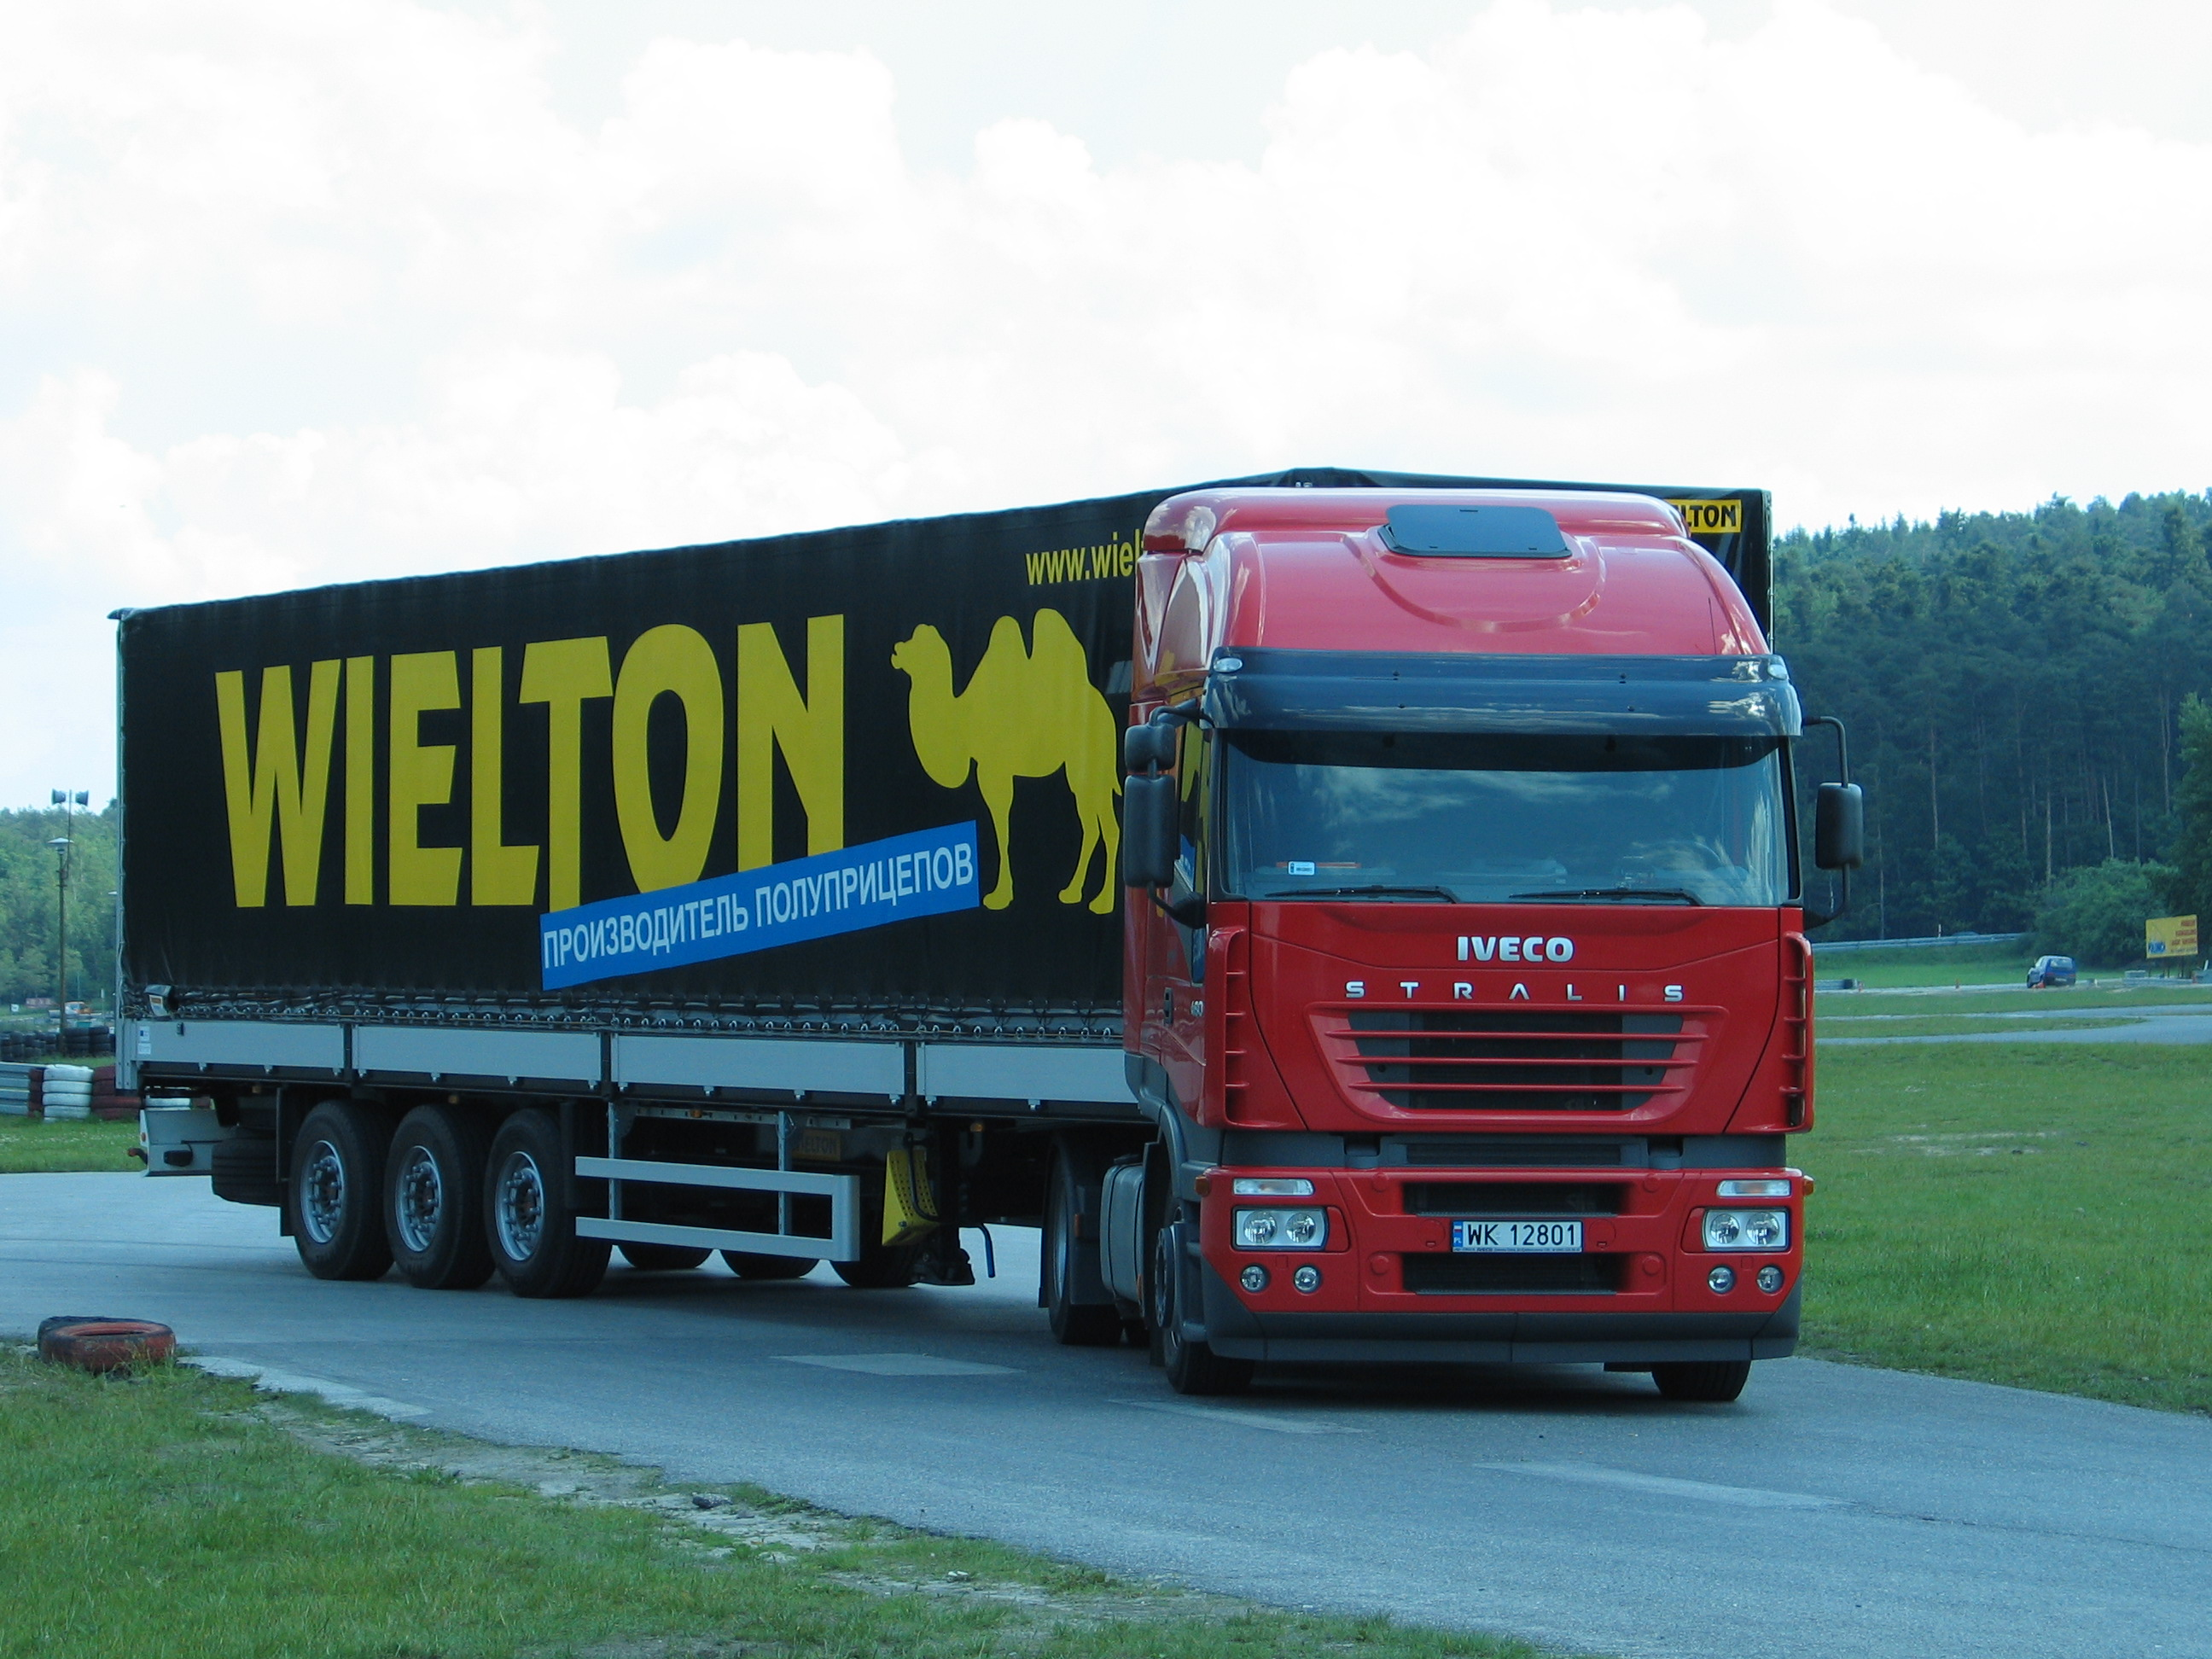 Wielton Romania